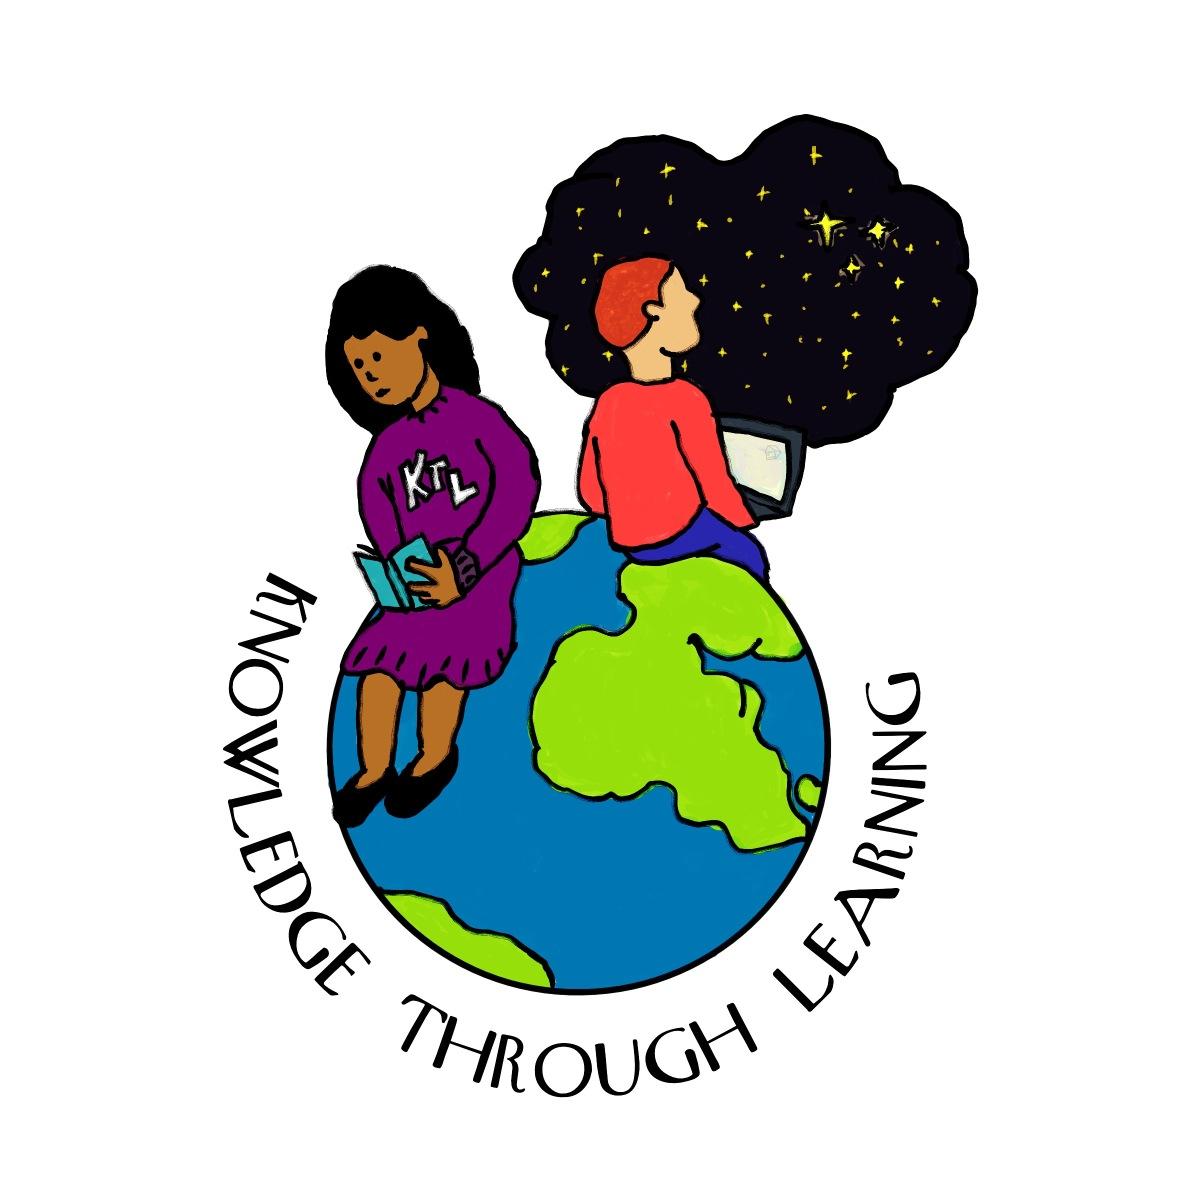 KTL logo (Priime Chiaroscuro)